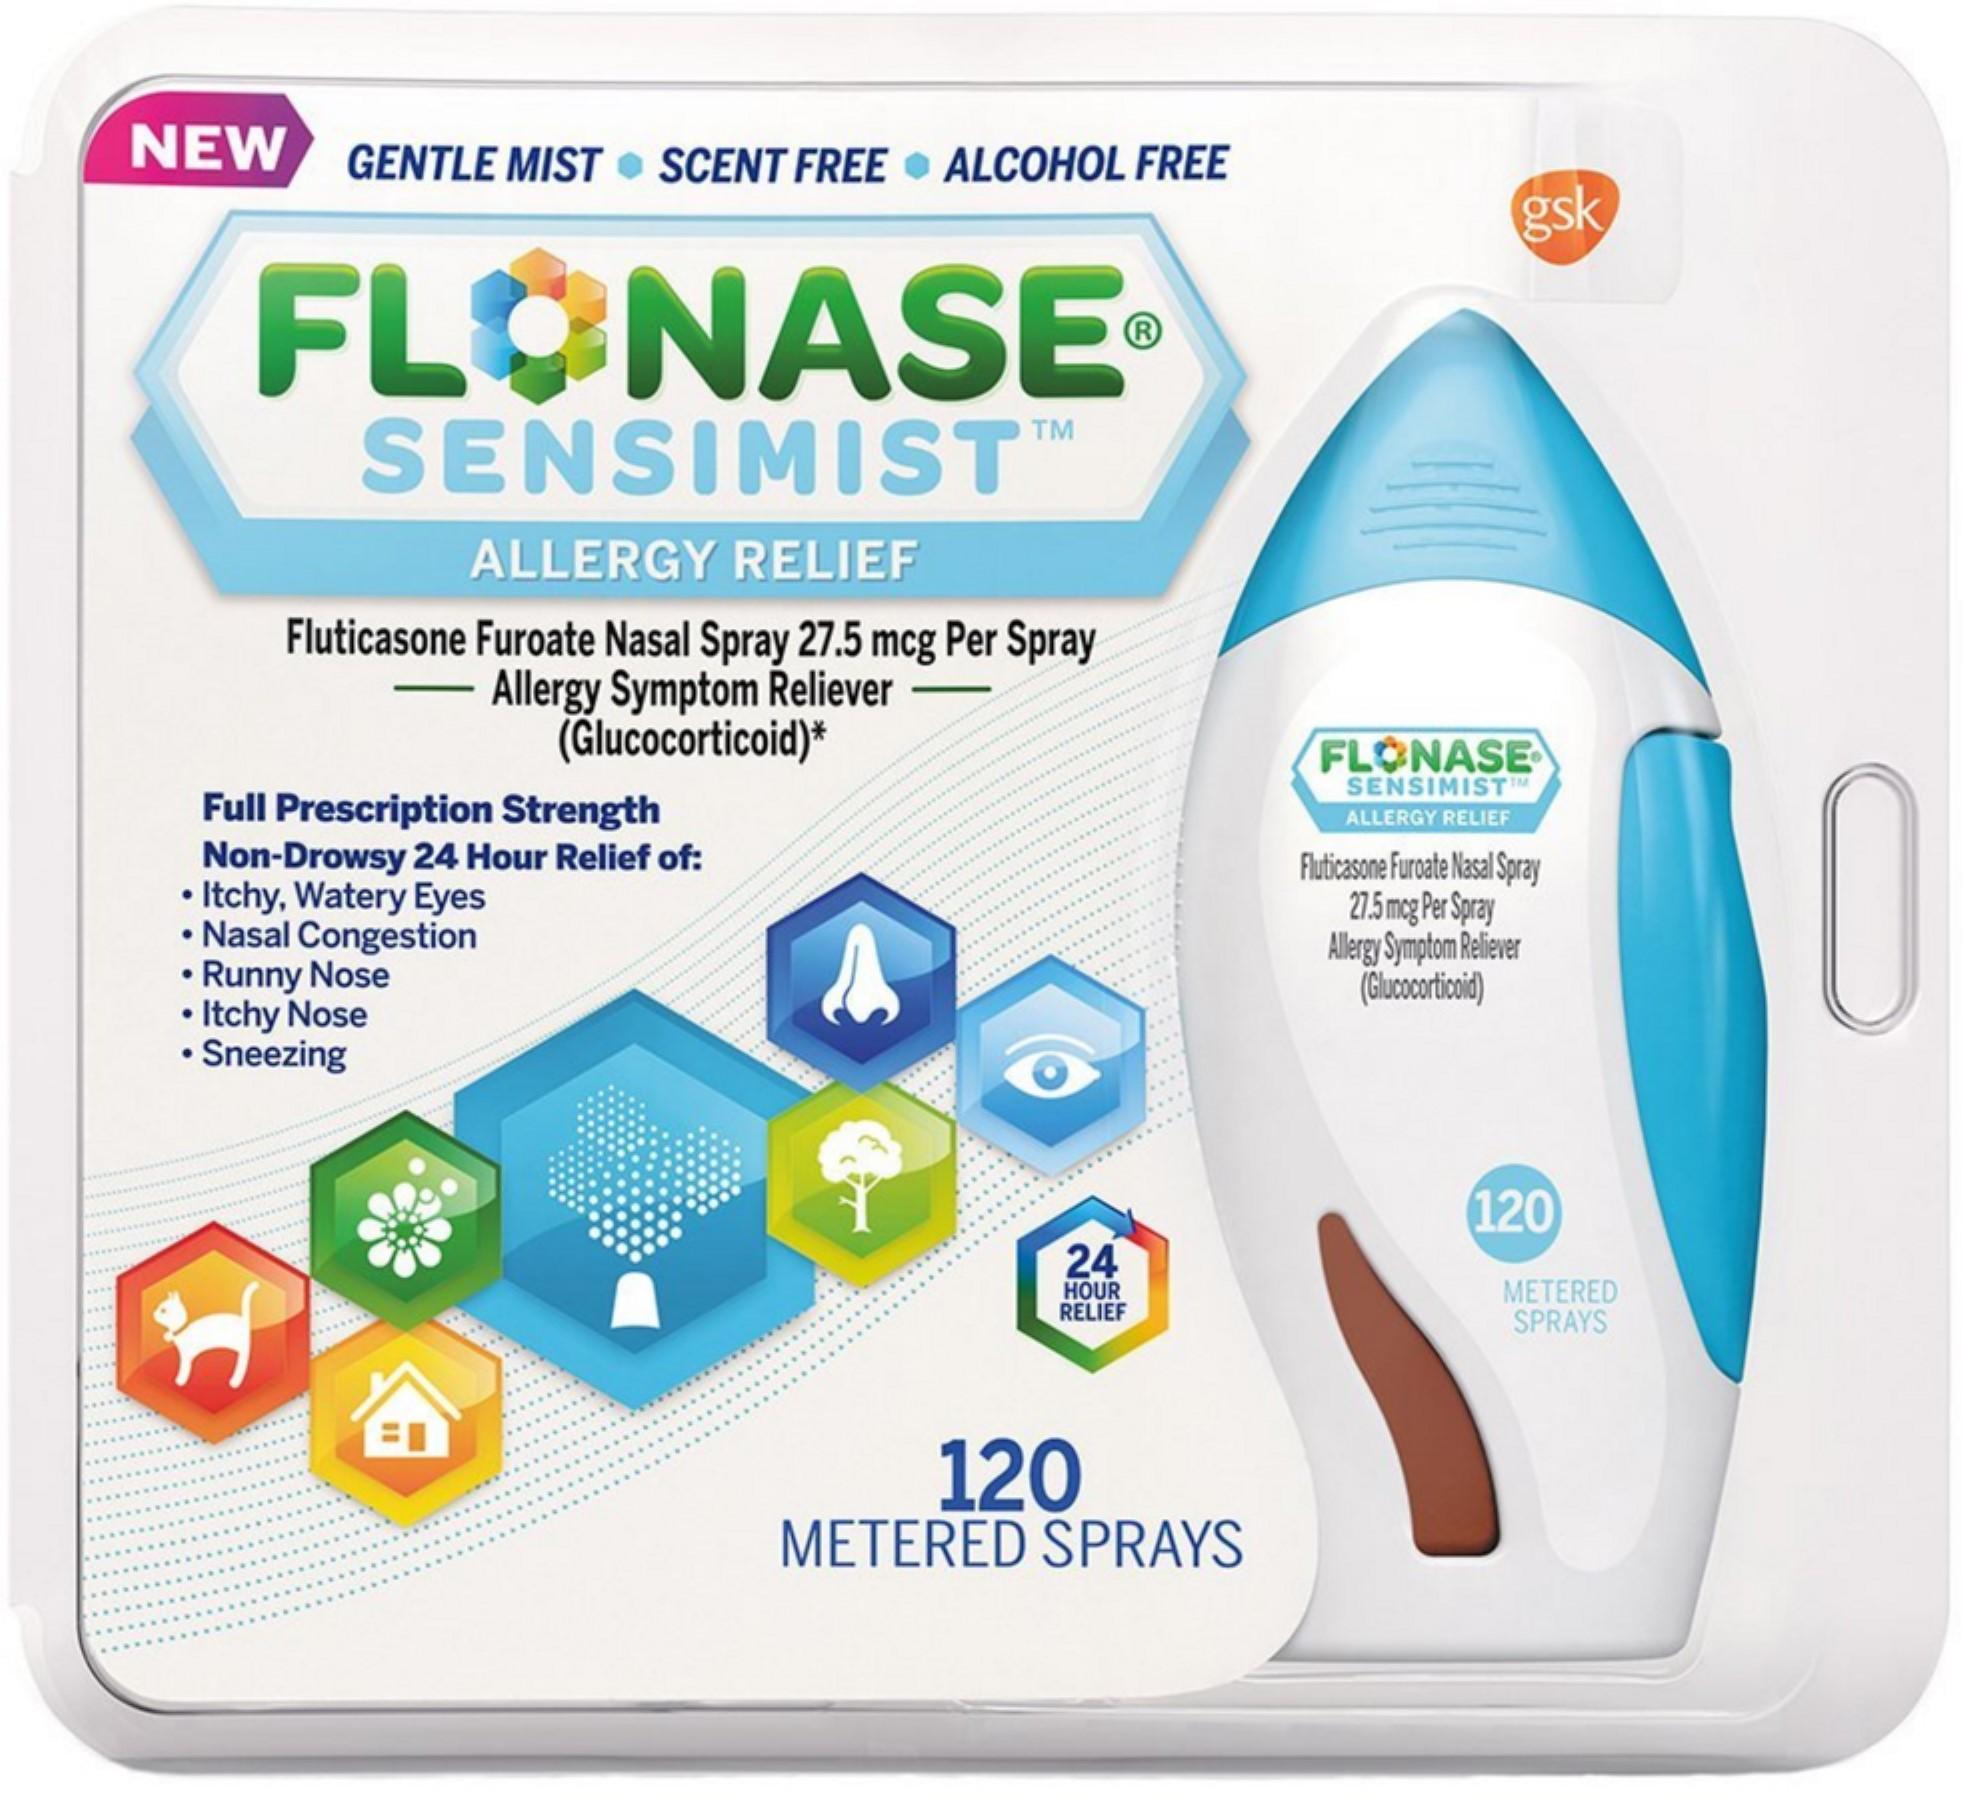 3 Pack - Flonase Sensimist Allergy Relief Spray, 120 Metered Sprays 1 ea